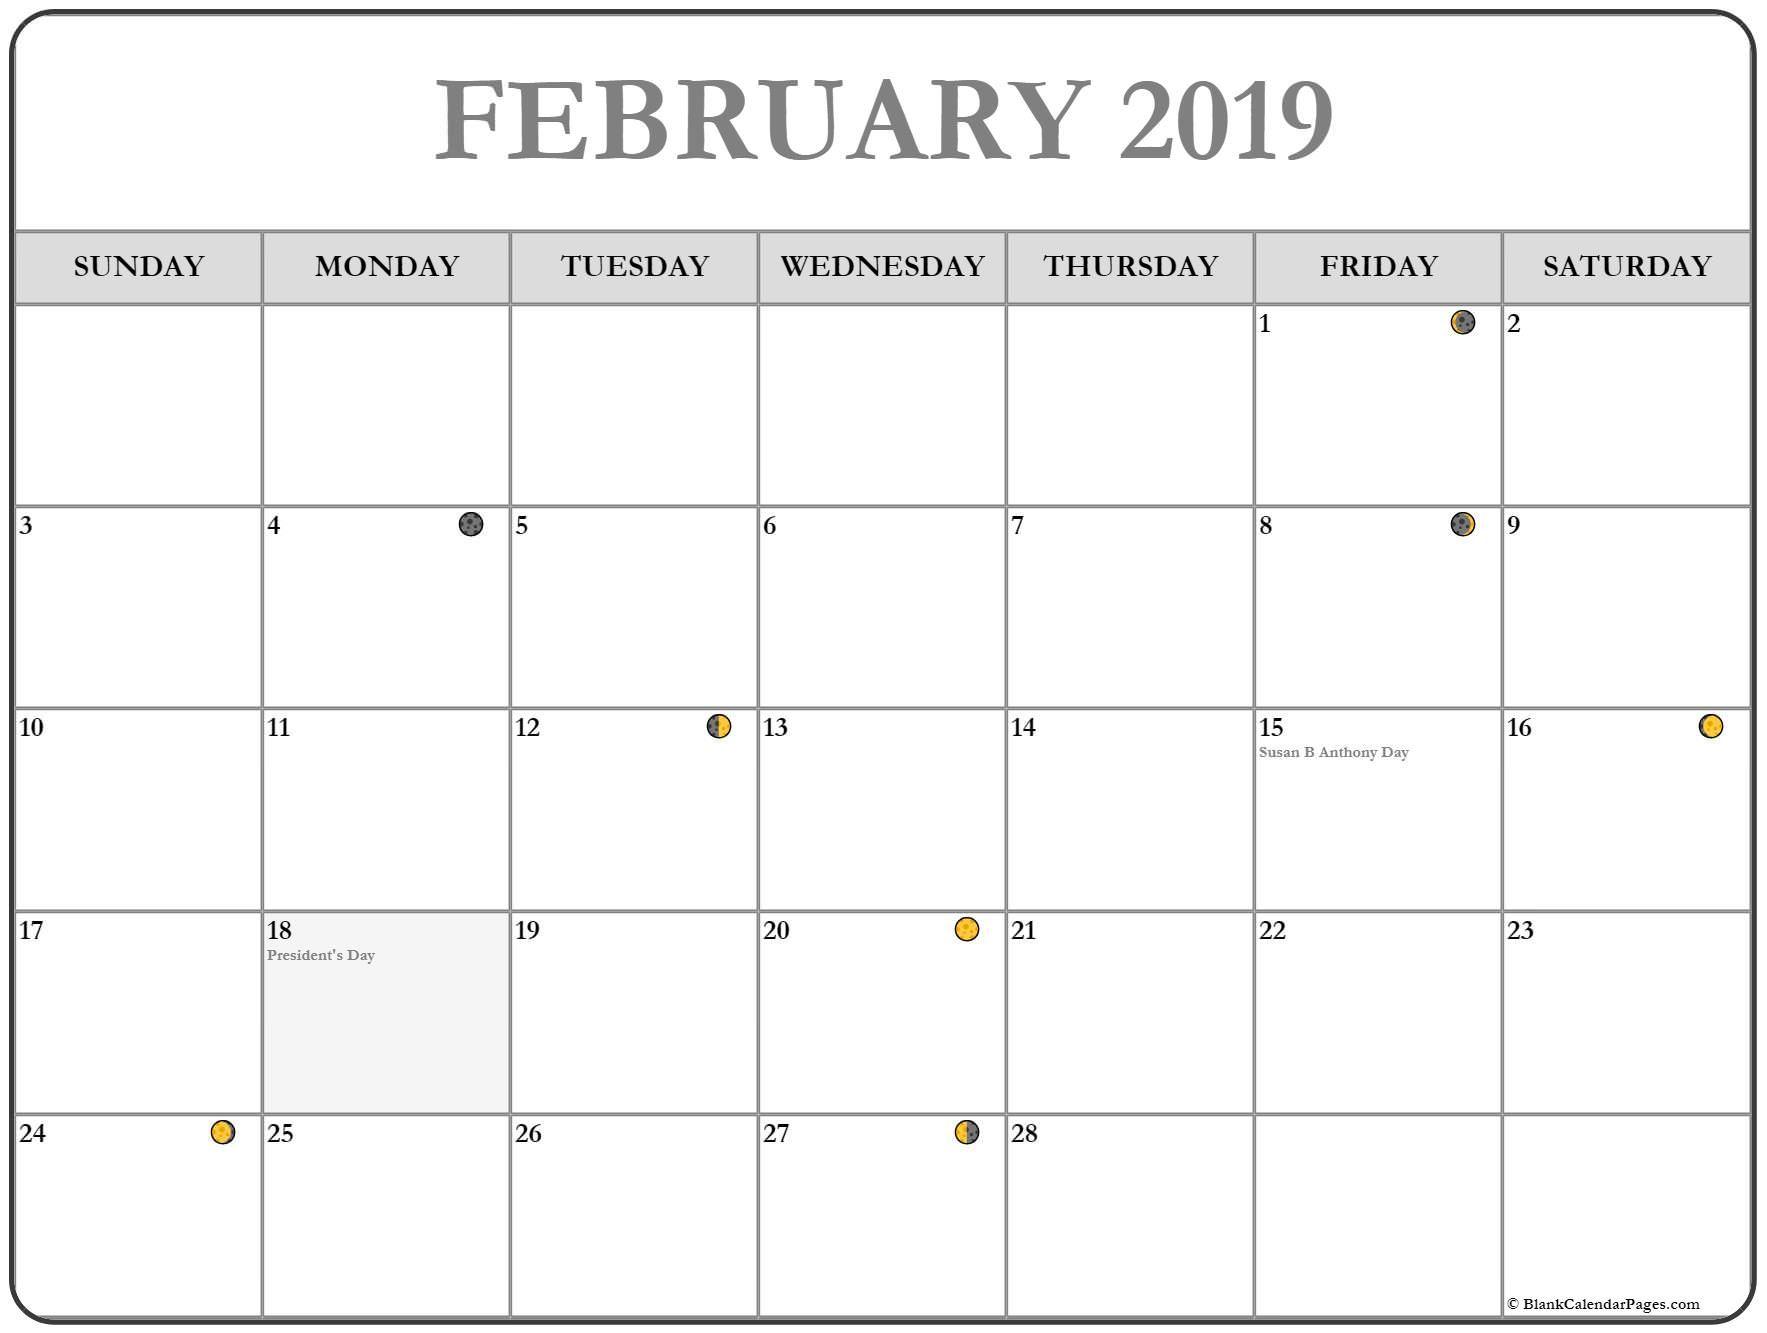 Calendar 2019 February Moon Phase February 2019 Calendar Calendar2019 February2019 Moon Phase Calendar Moon Calendar Calendar Printables